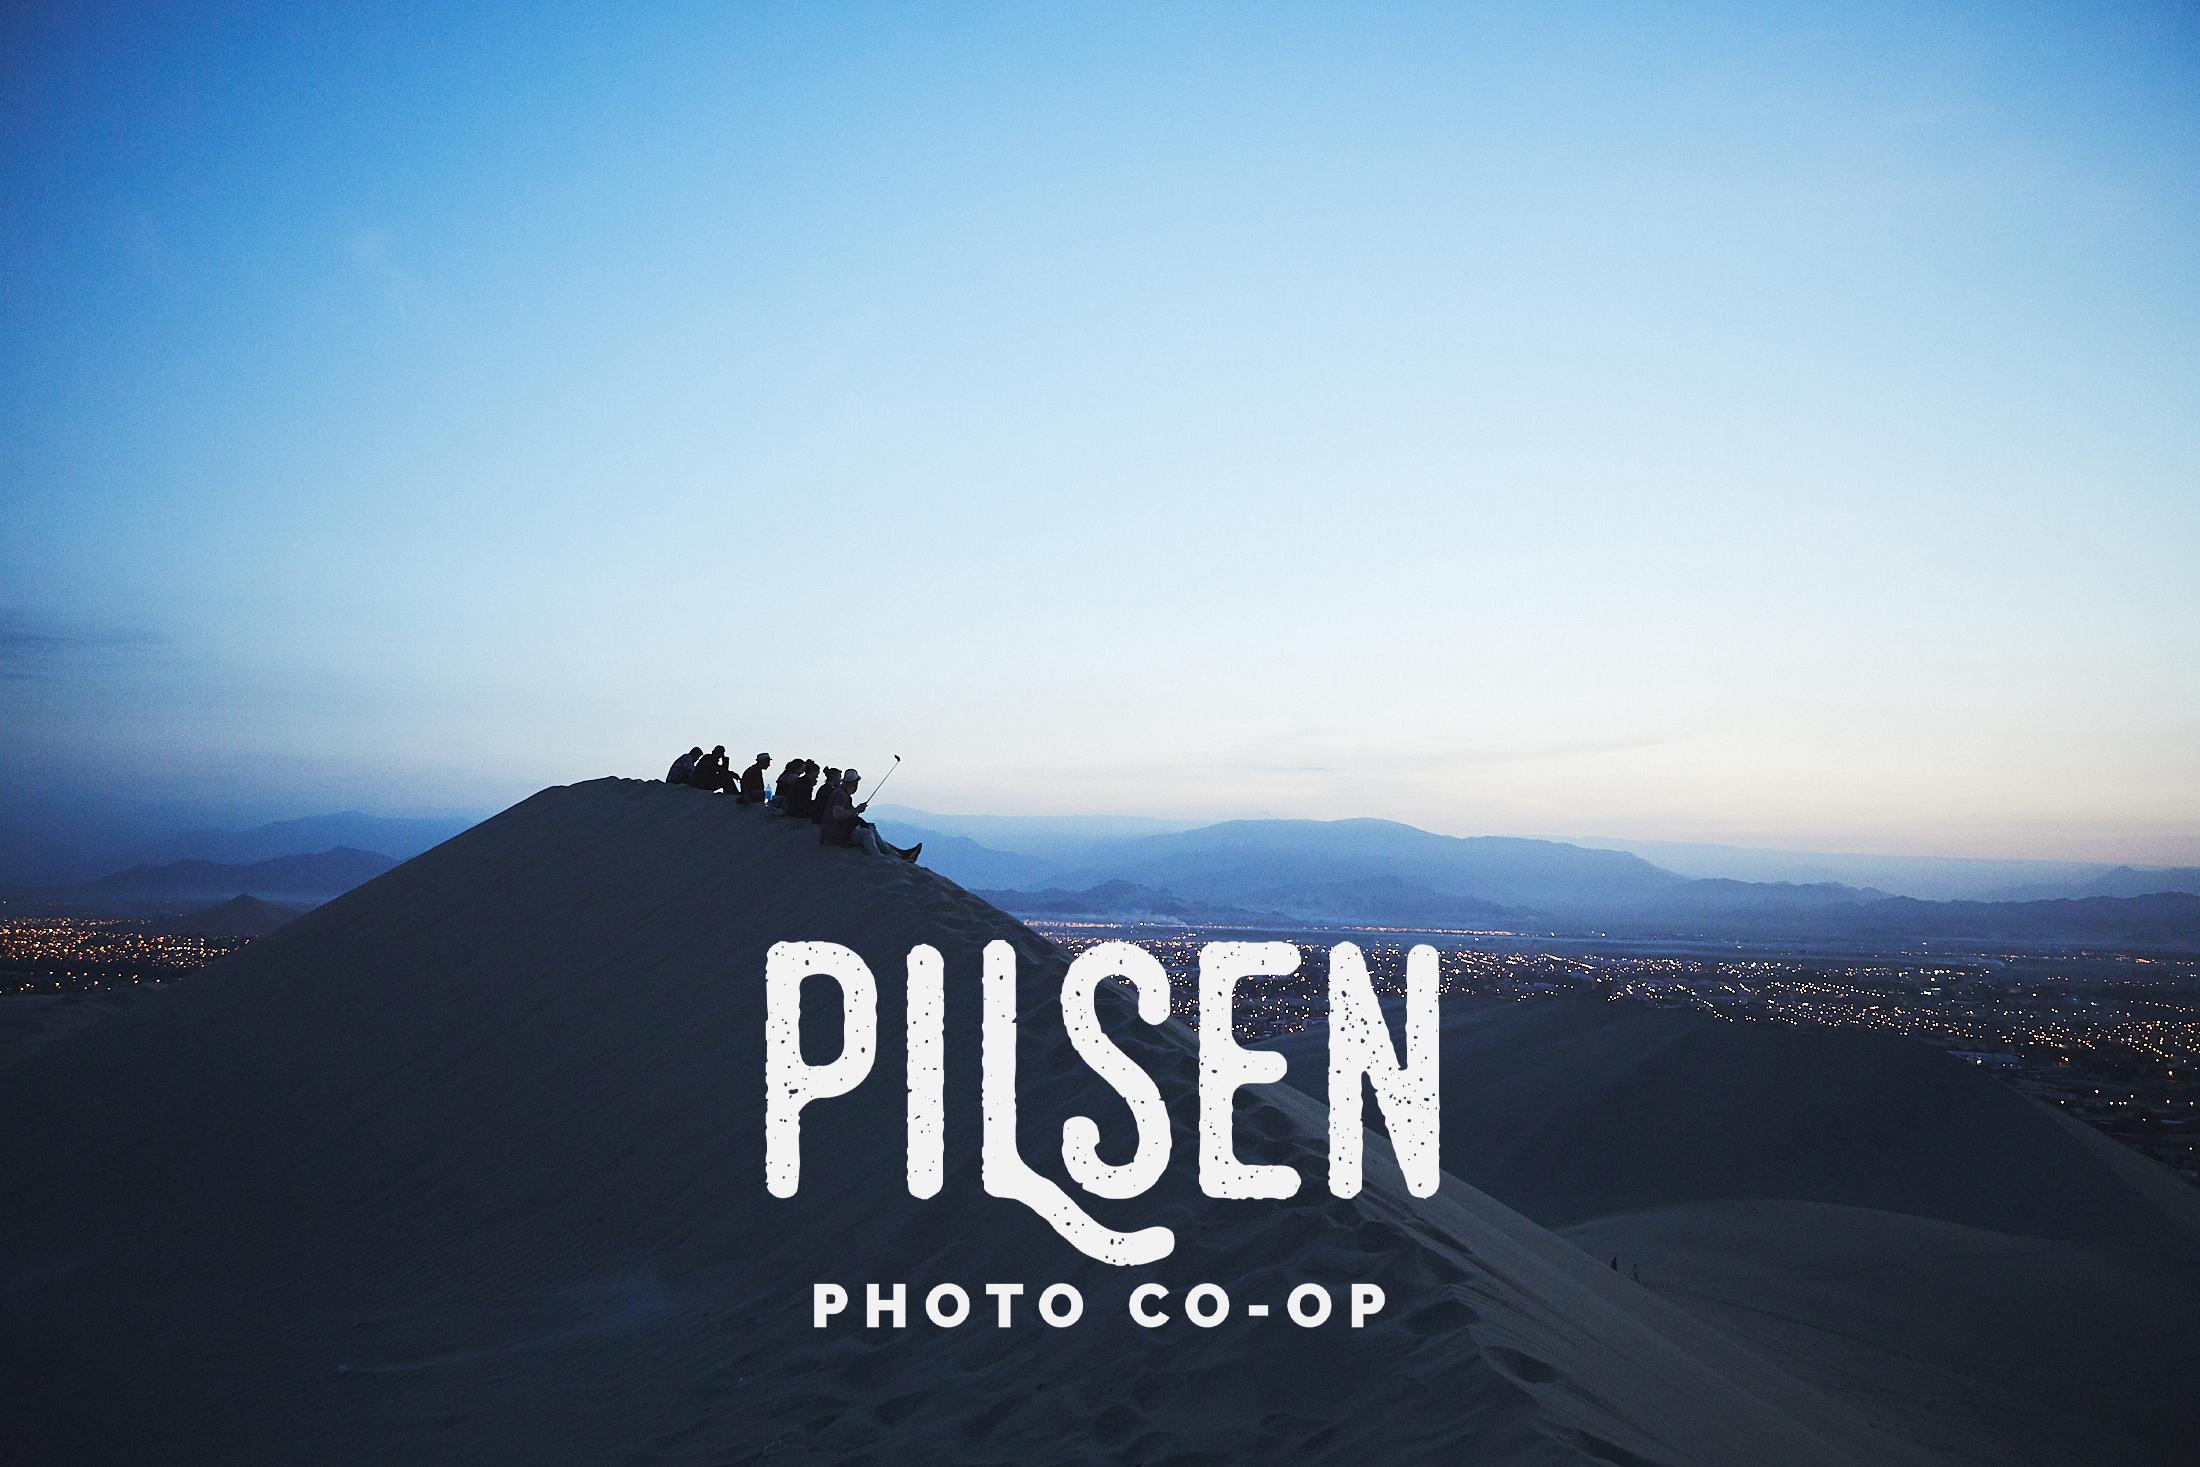 PILSEN